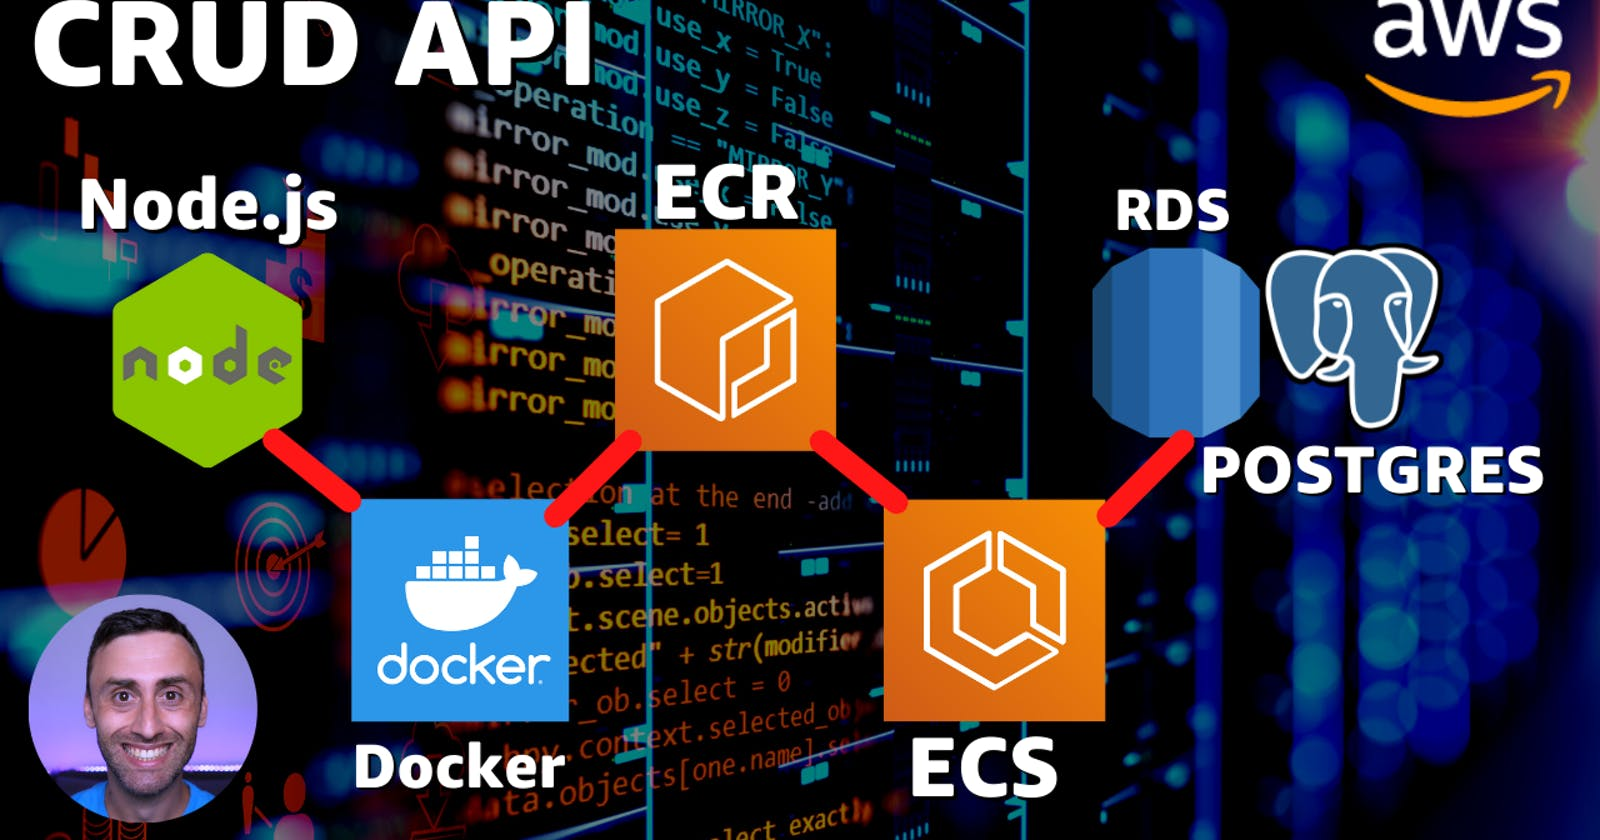 CRUD API Express with RDS, ECS and Docker